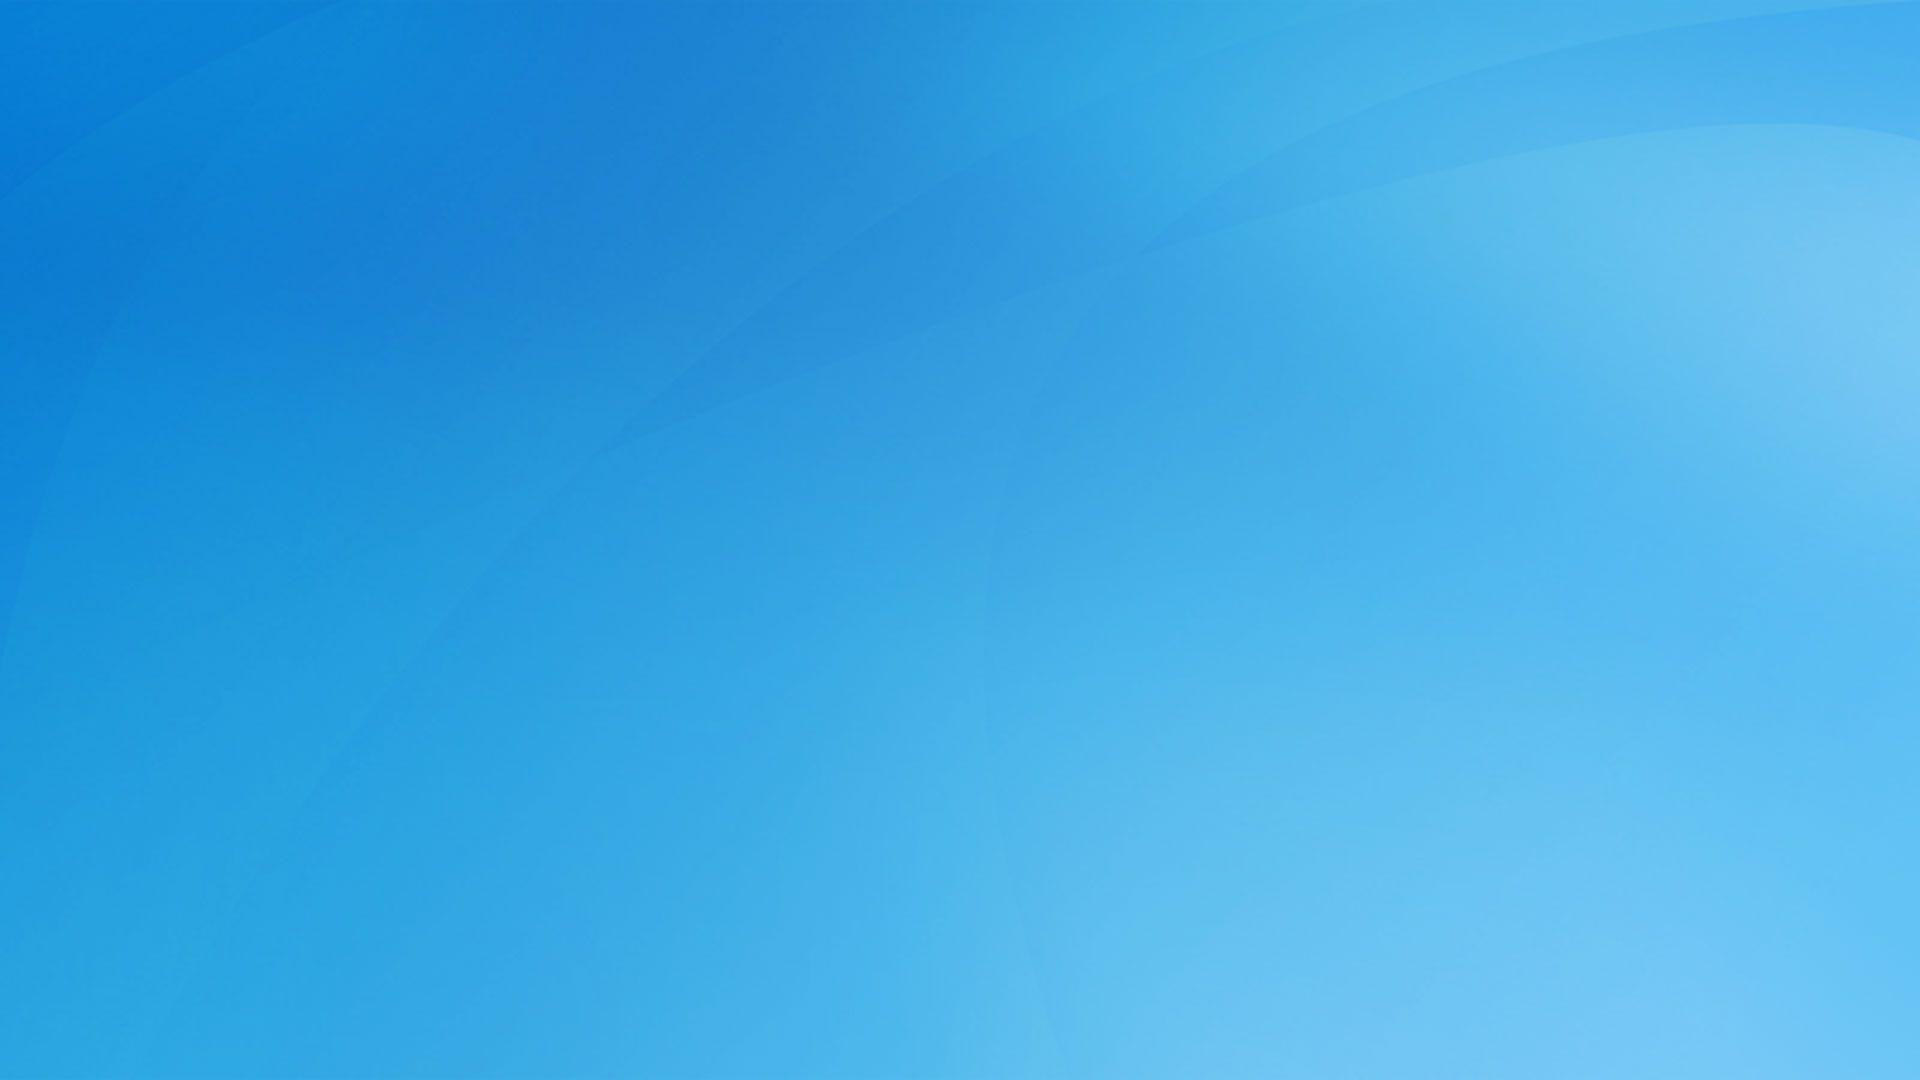 Plain Blue Backgrounds Wallpapers 1920x1080